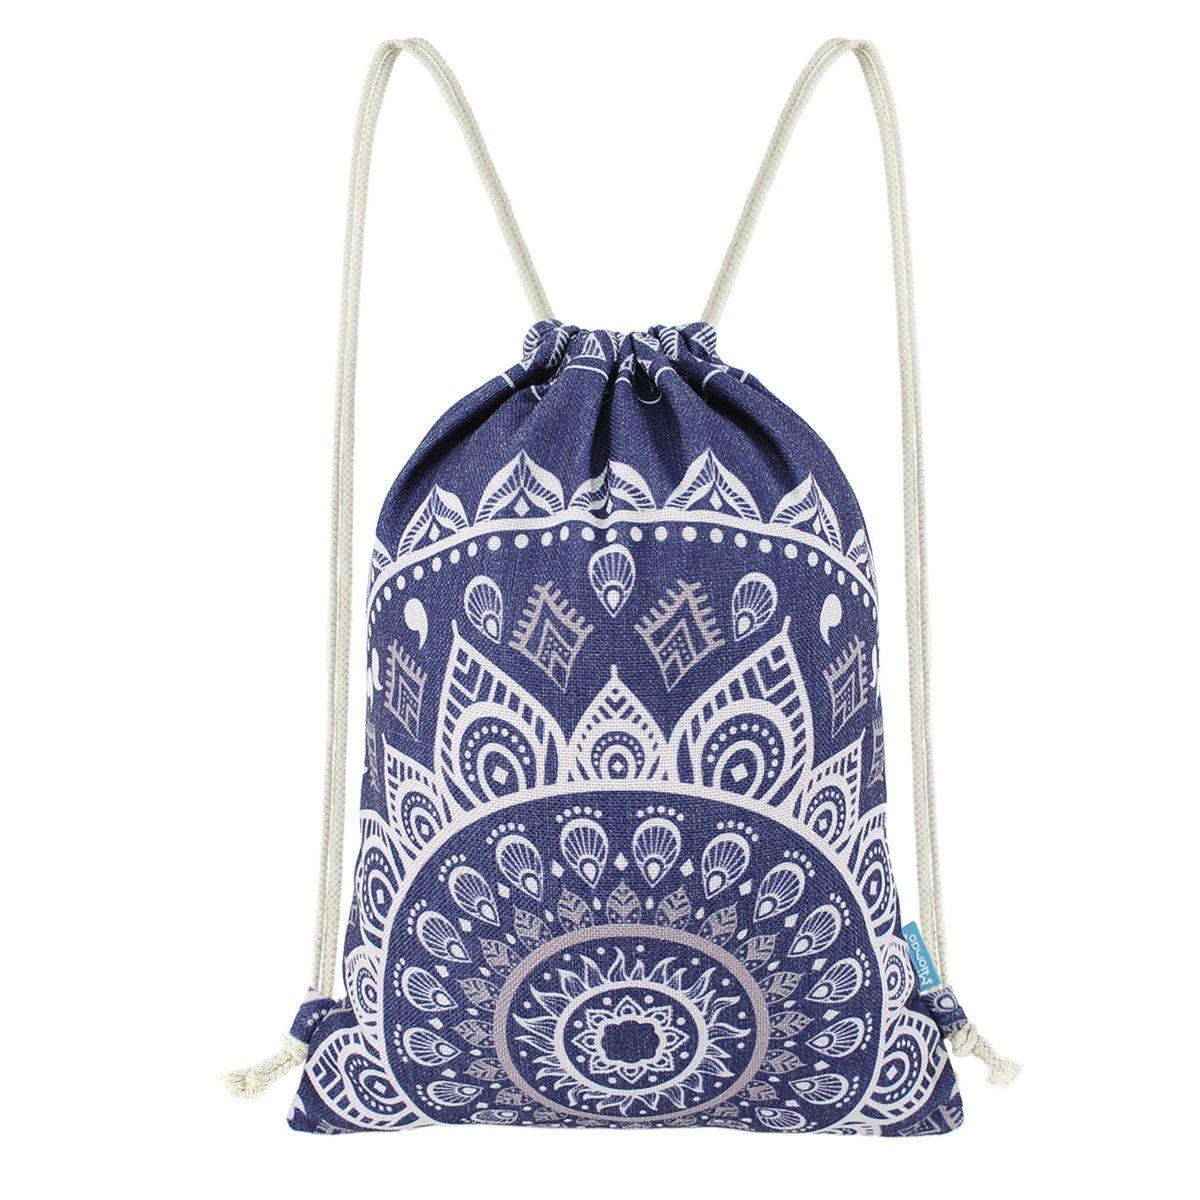 72680d5005 Adidas Originals Paisley Print Drawstring Backpack- Fenix Toulouse ...